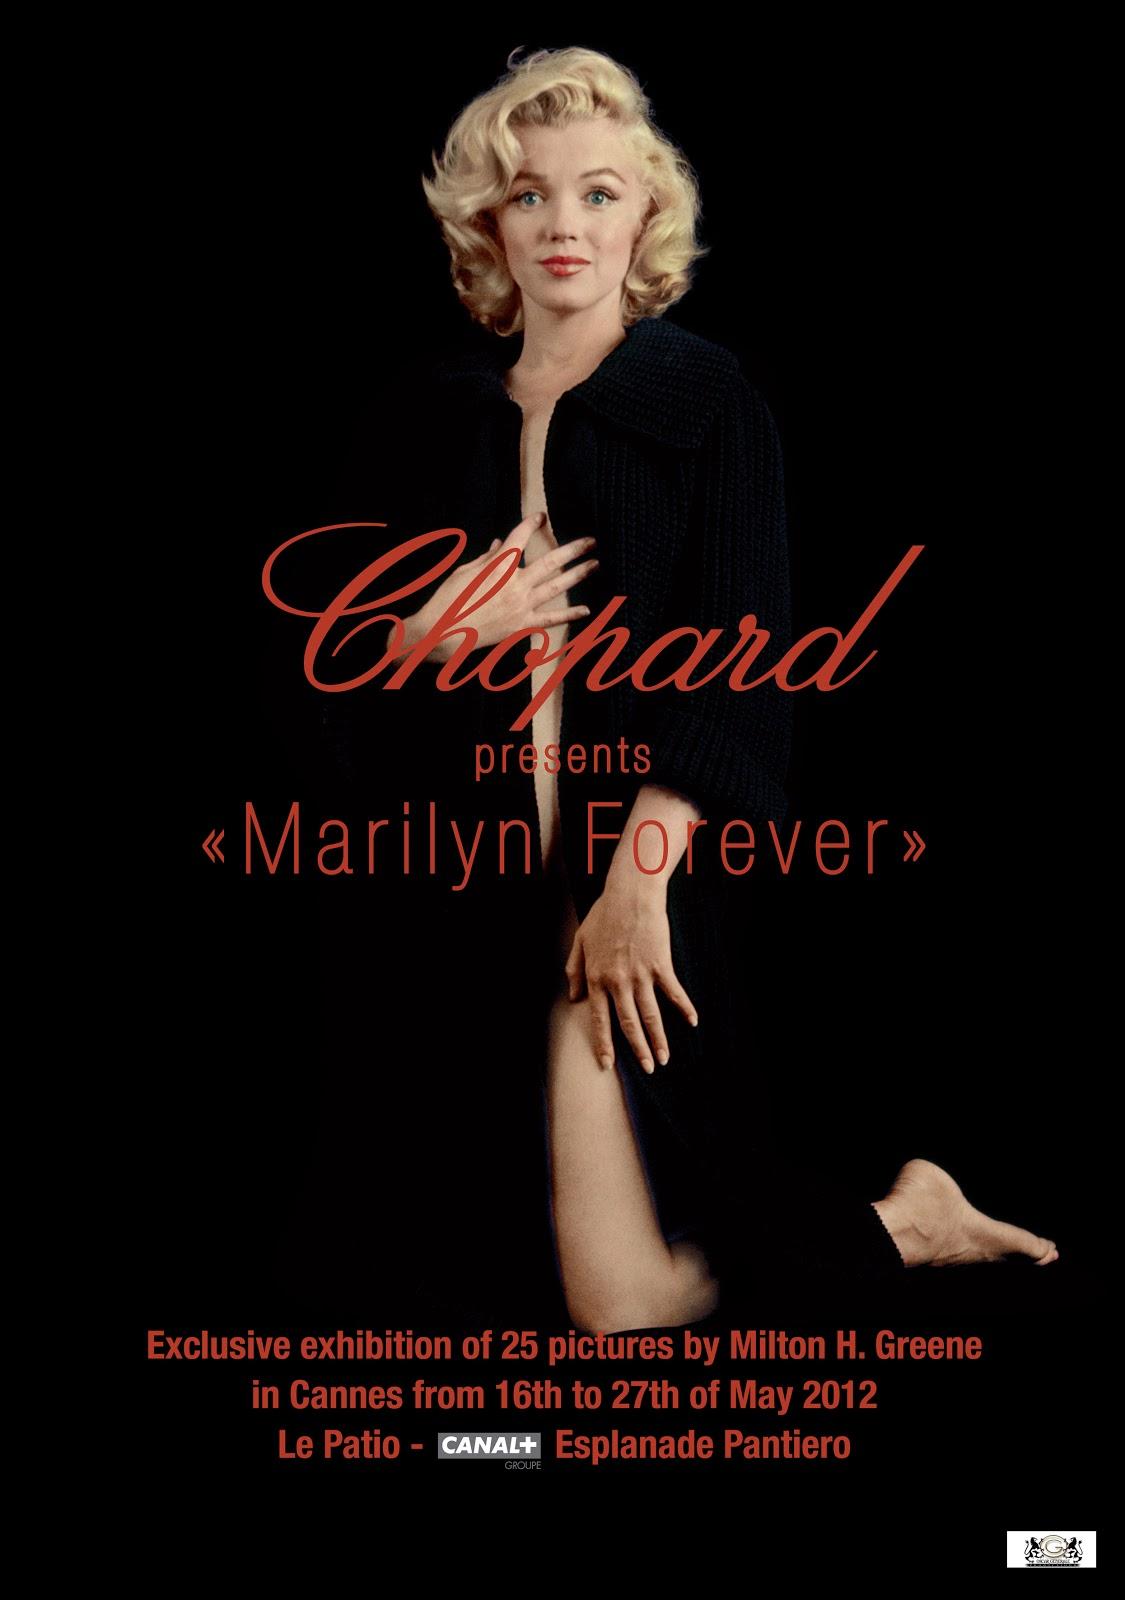 http://4.bp.blogspot.com/-H7xvaAajcoQ/T7qtr303gLI/AAAAAAAAmN8/tNIvz7asOeI/s1600/Marilyn-Forever-Photo-Exhibition_poster1.jpg